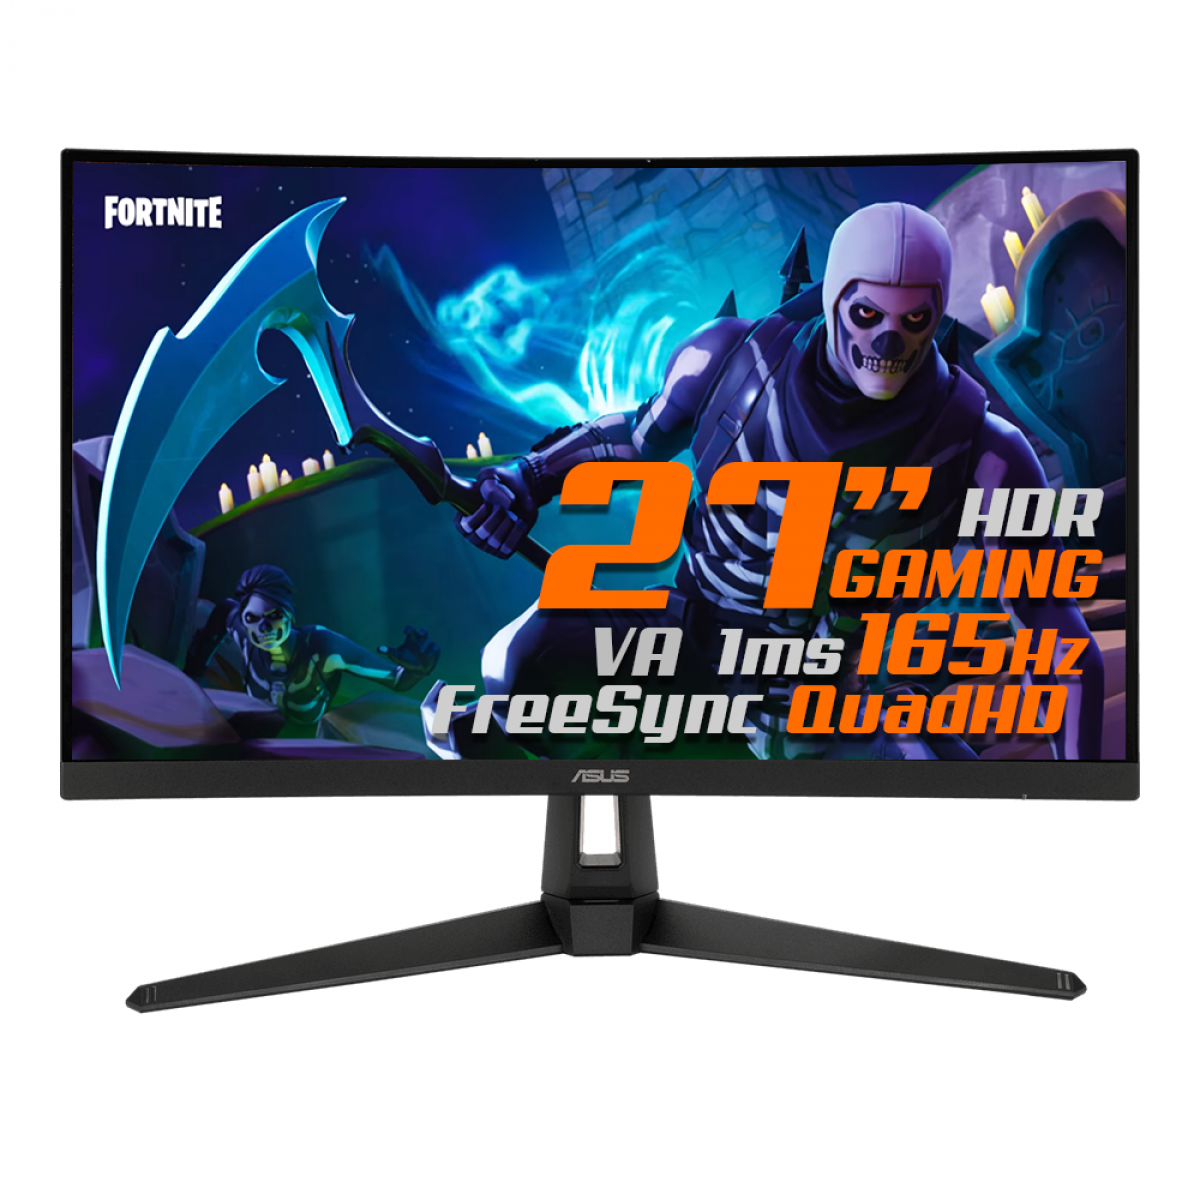 Monitor Gamer ASUS TUF Gaming, 27 Pol, Curvo, QuadHD, 165Hz, 1ms, HDR, FreeSync Premium, DP/HDMI, VG27WQ1B